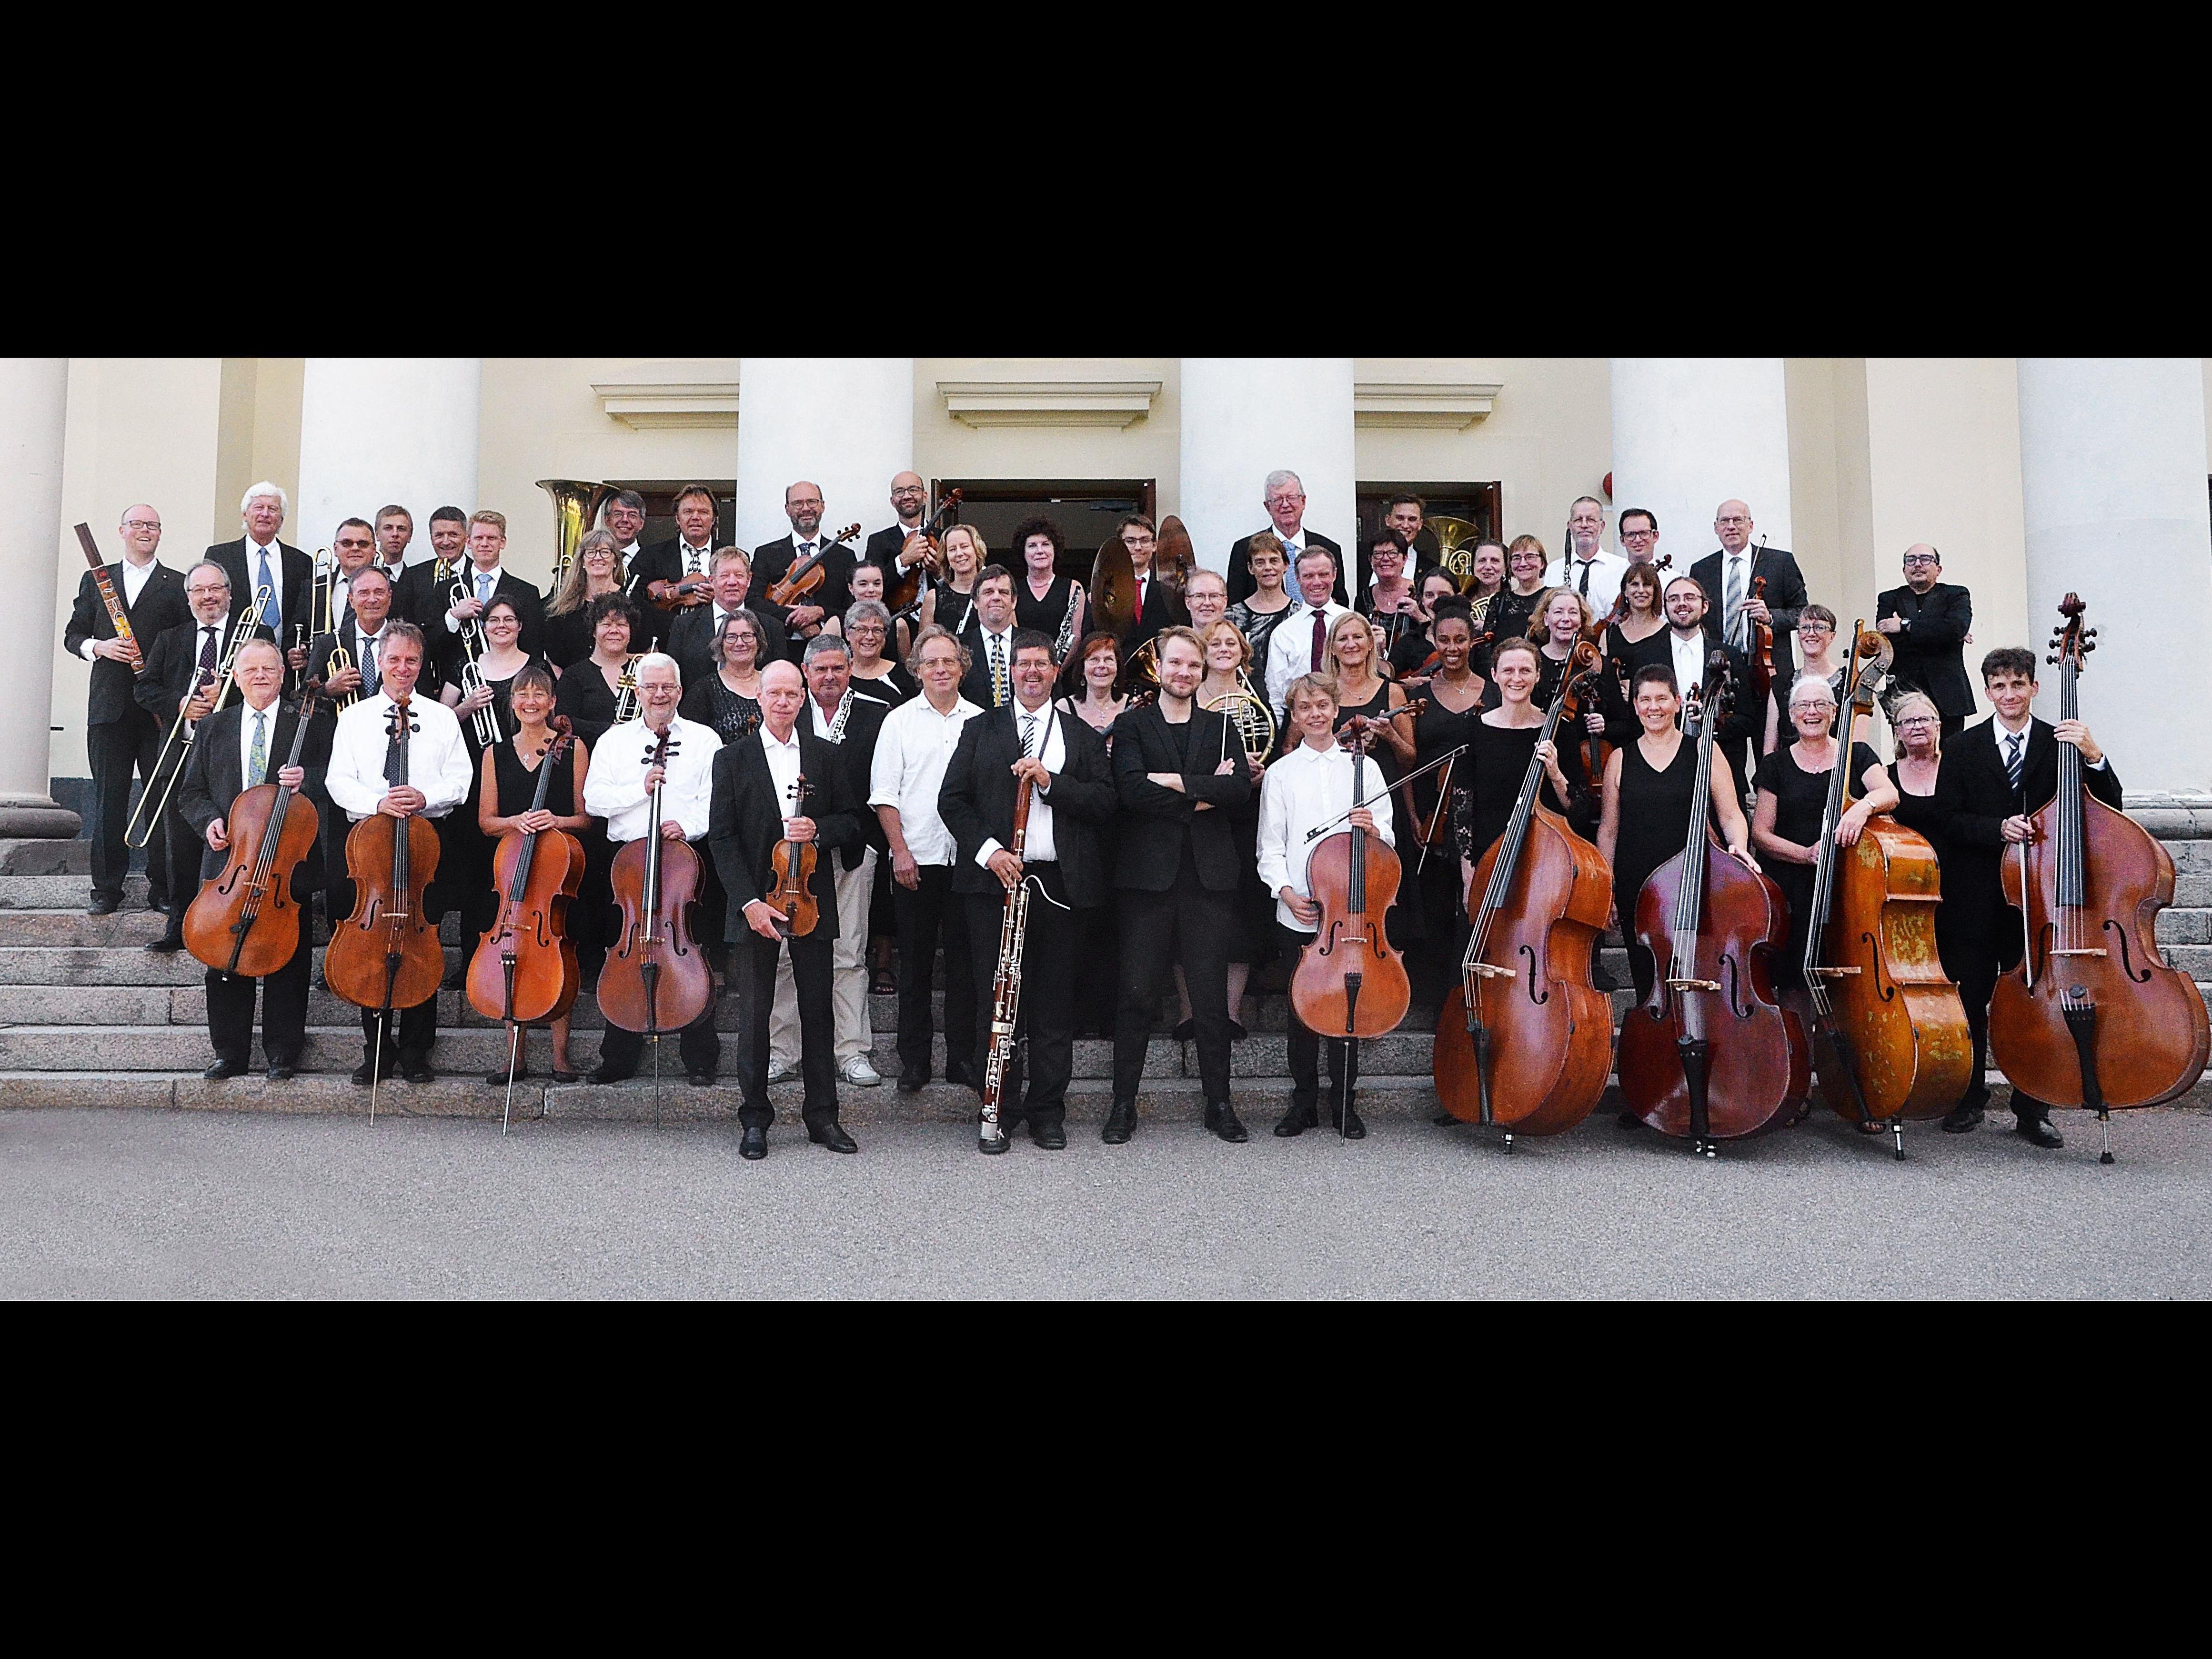 Symfonisk Festkonsert Bergslagens Kammarsymfoniker